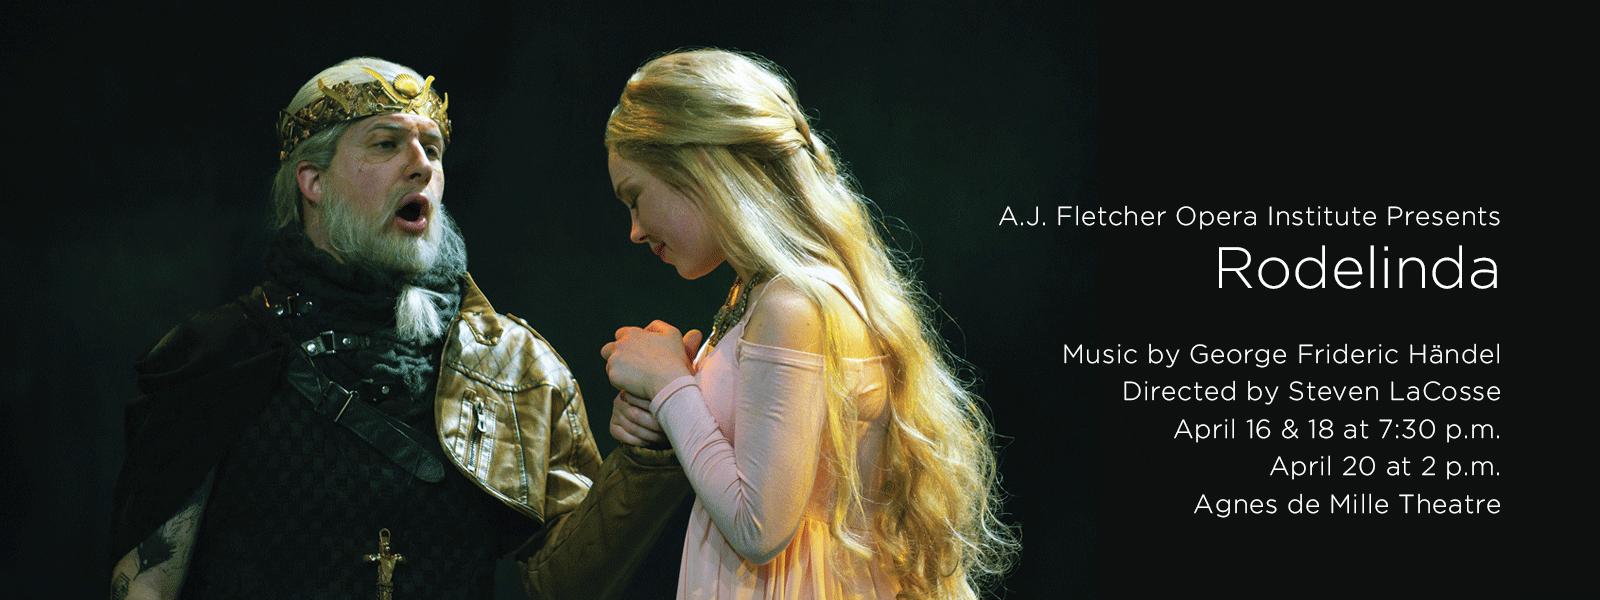 "Enjoy the A.J. Fletcher Opera Institute's final performance of the season ""Rodelinda"">>BUY TICKETS"